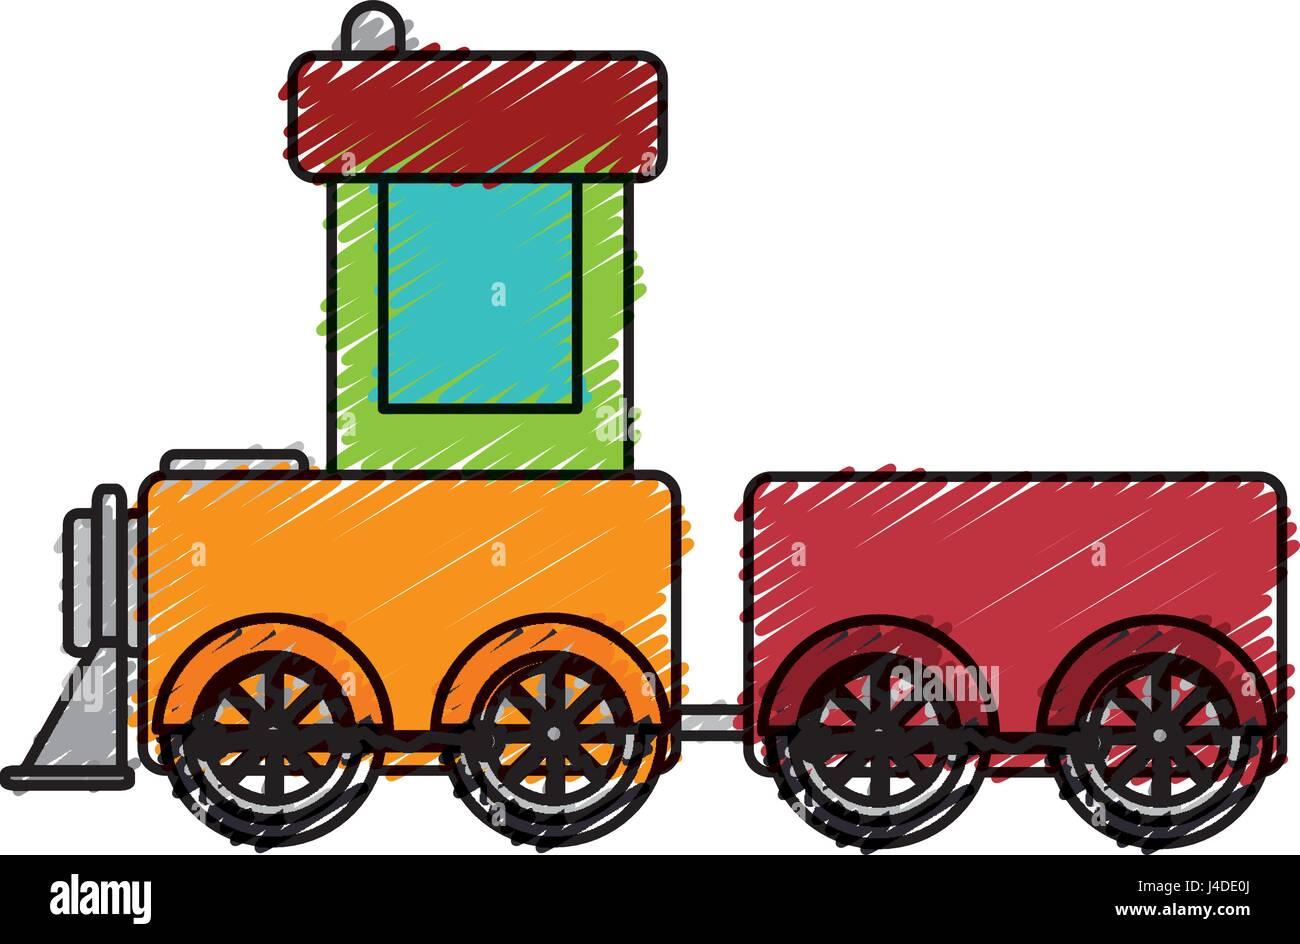 cute train toy icon Stock Vector